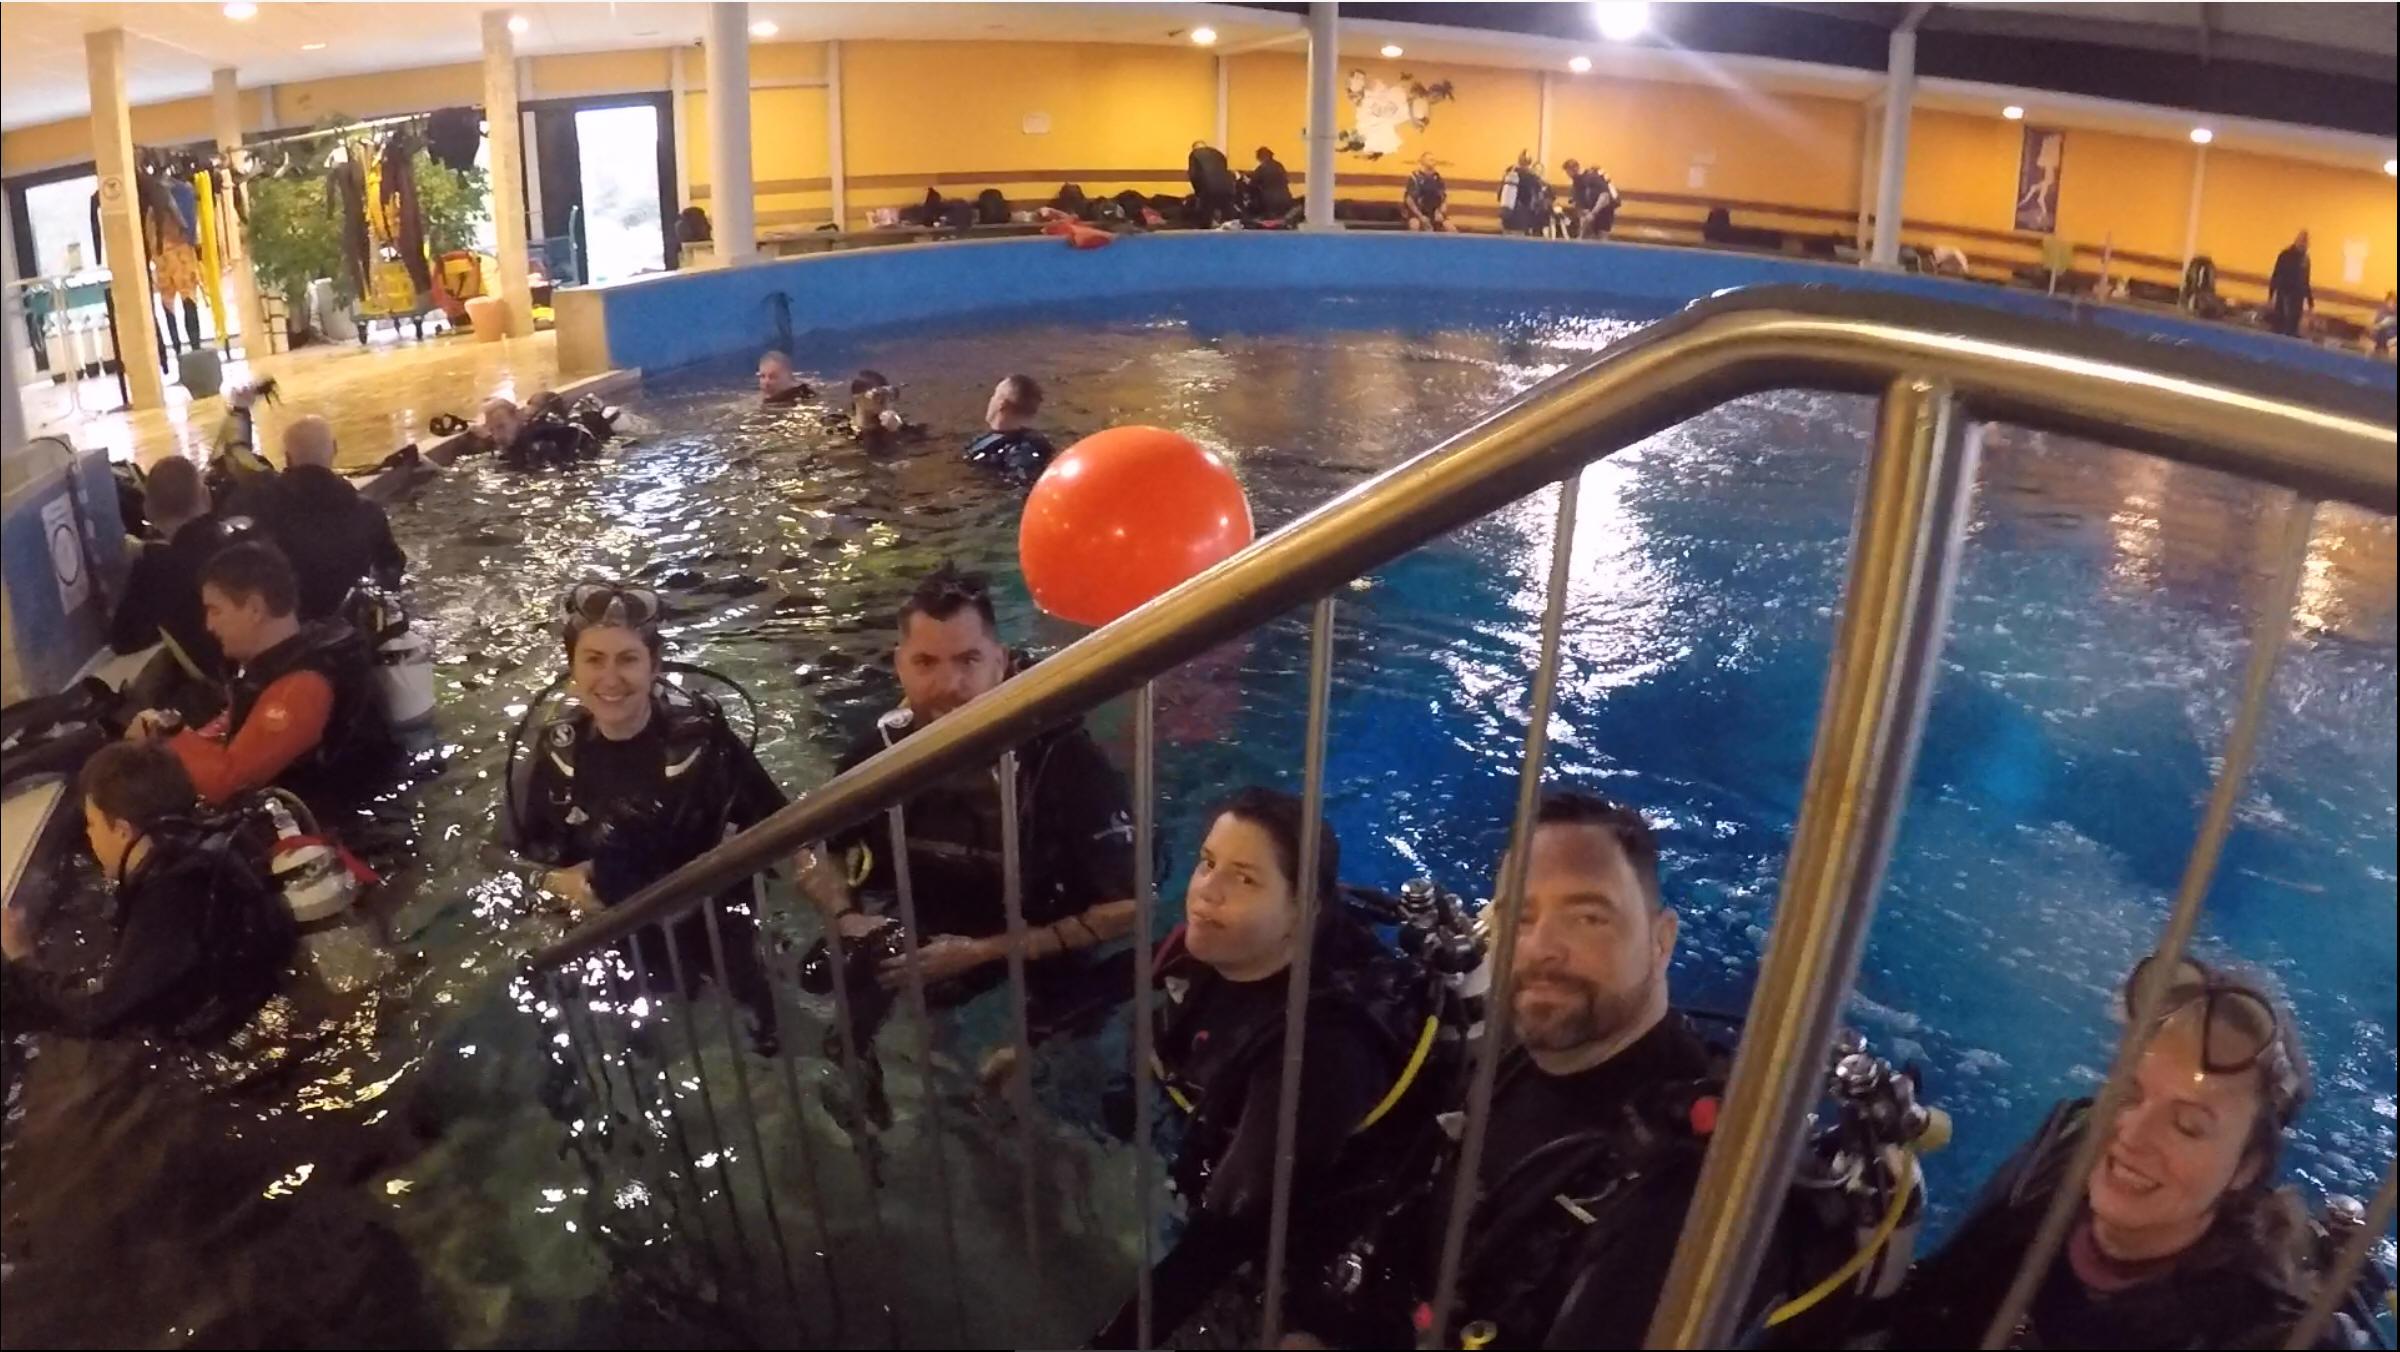 201801_CPS_Sortie Fosse Dive4Life_032